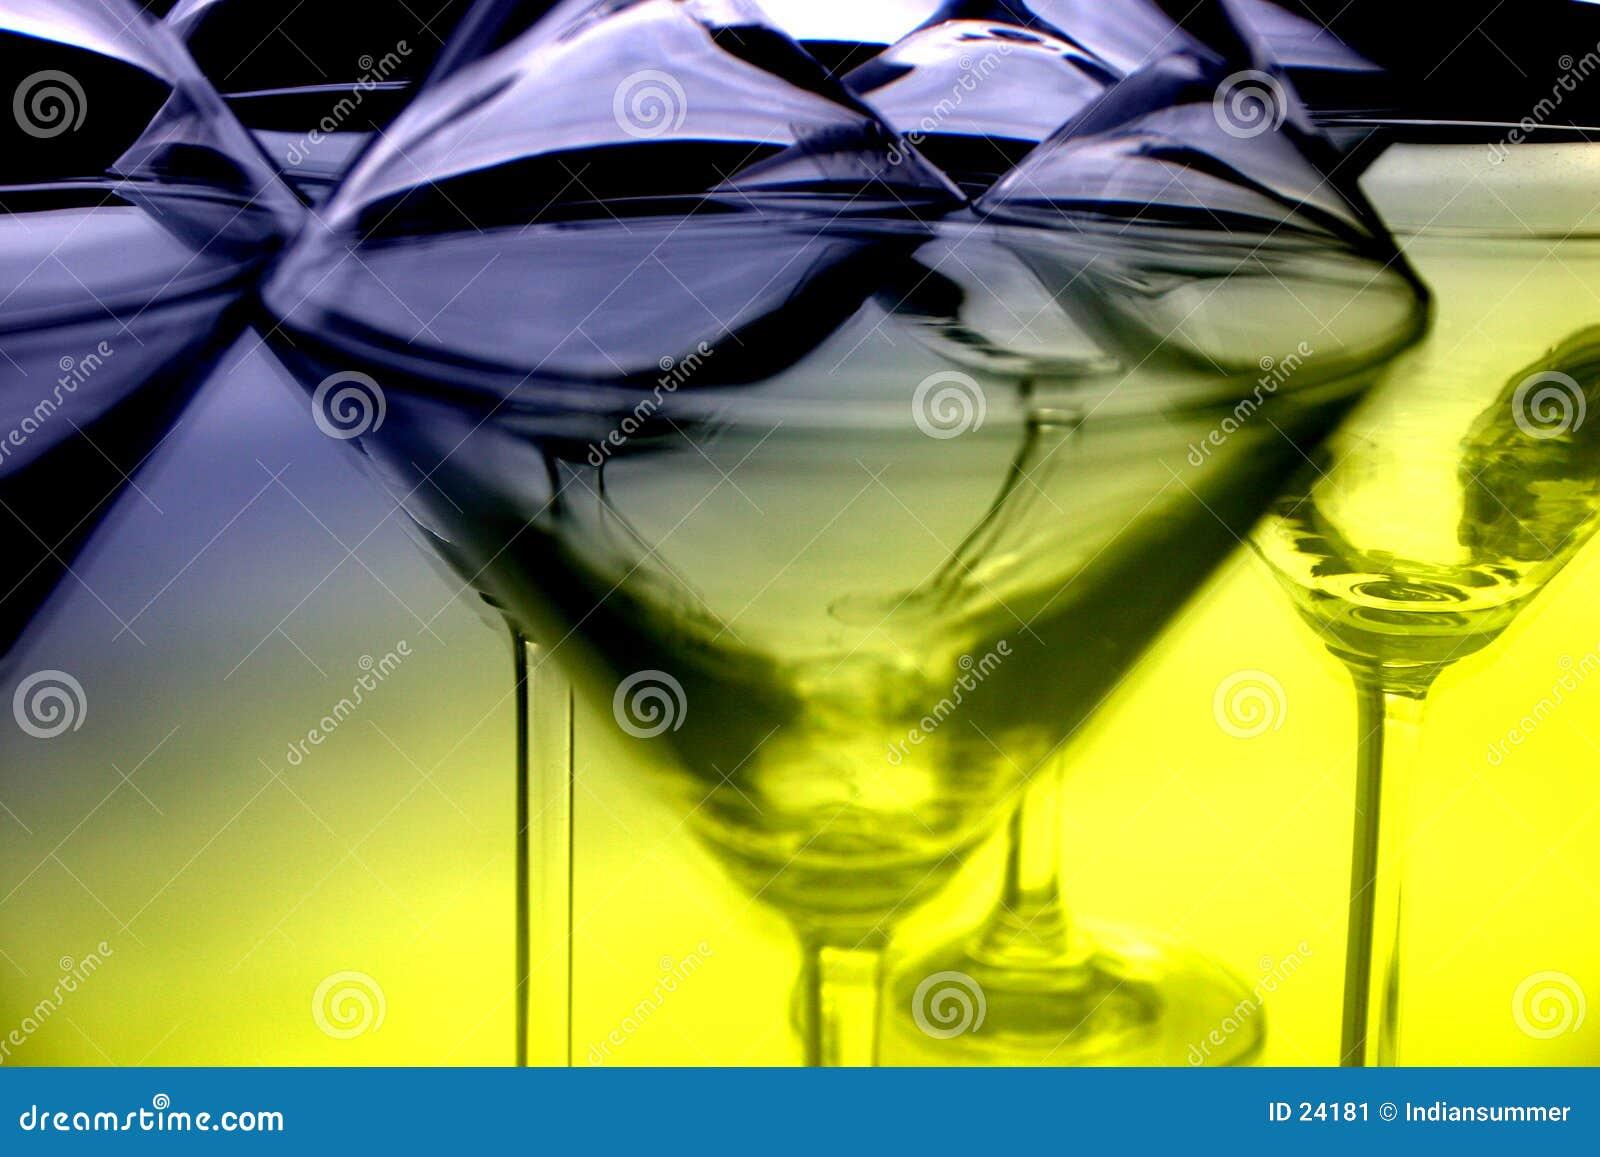 Iii szklanki Martini